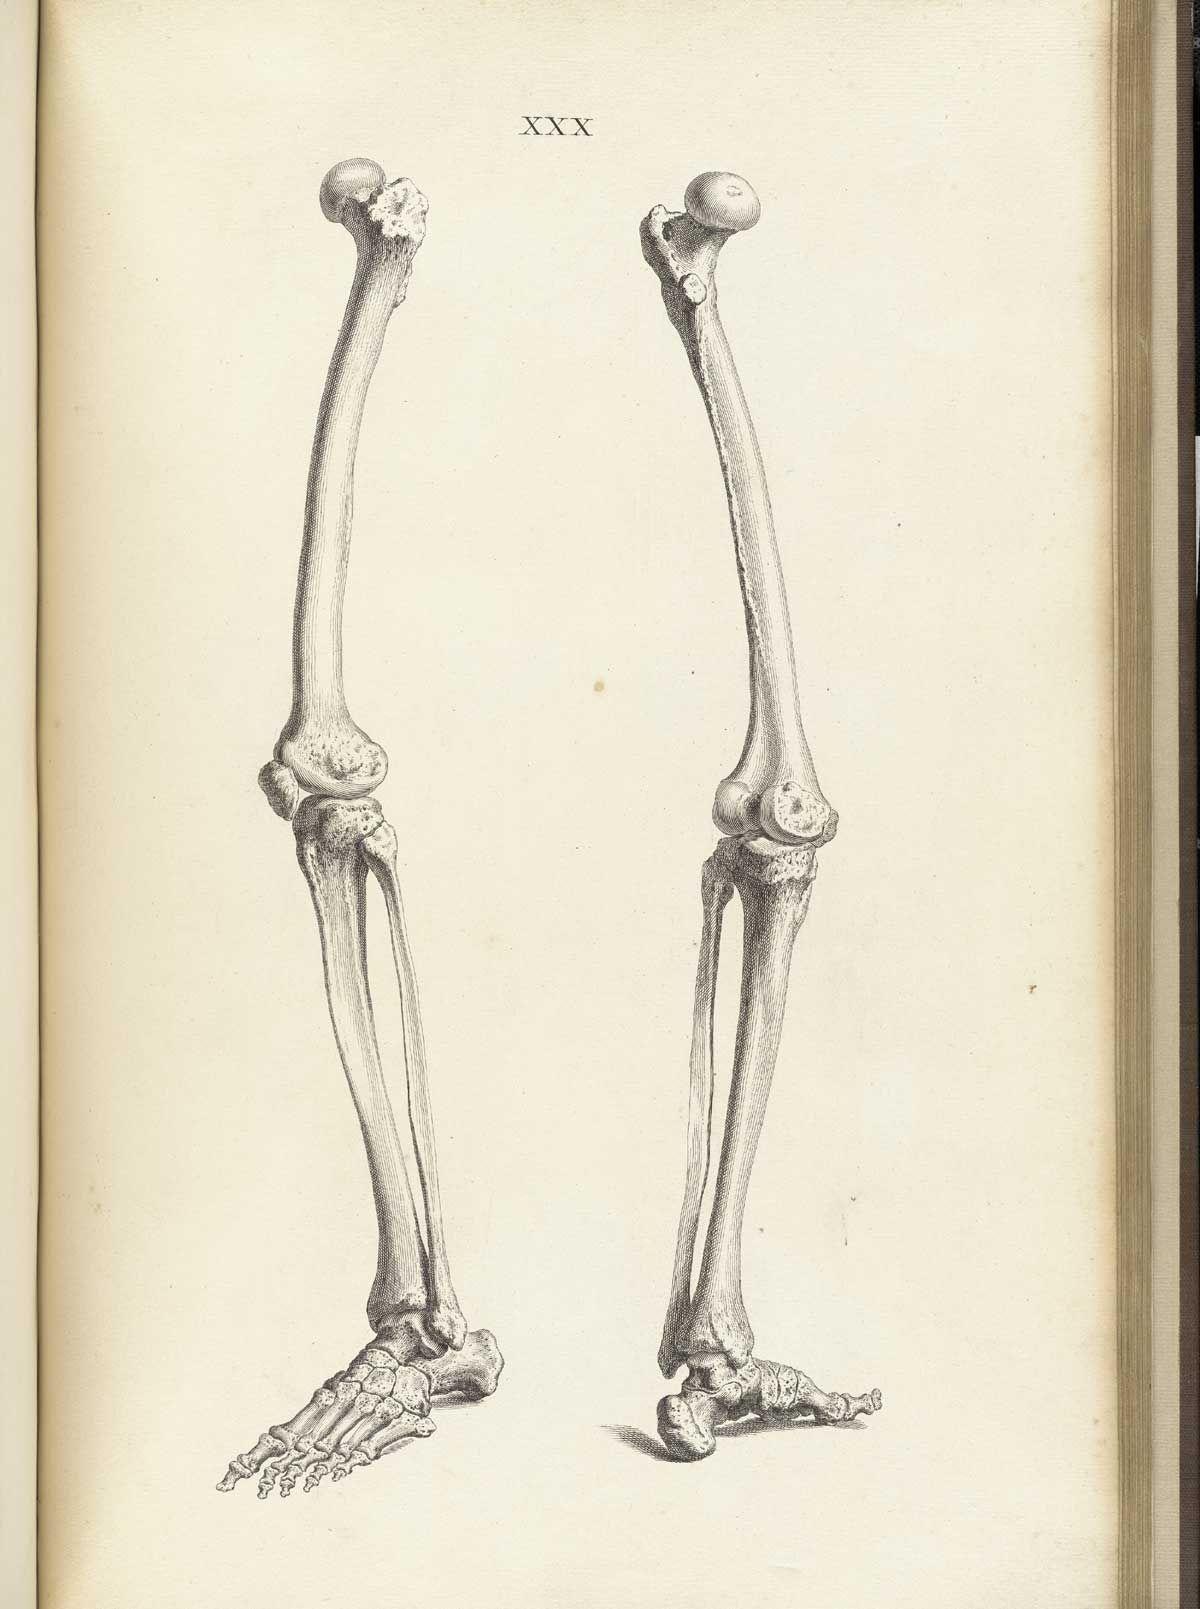 Pin de Dani Marie en Aesthetics | Pinterest | Anatomía